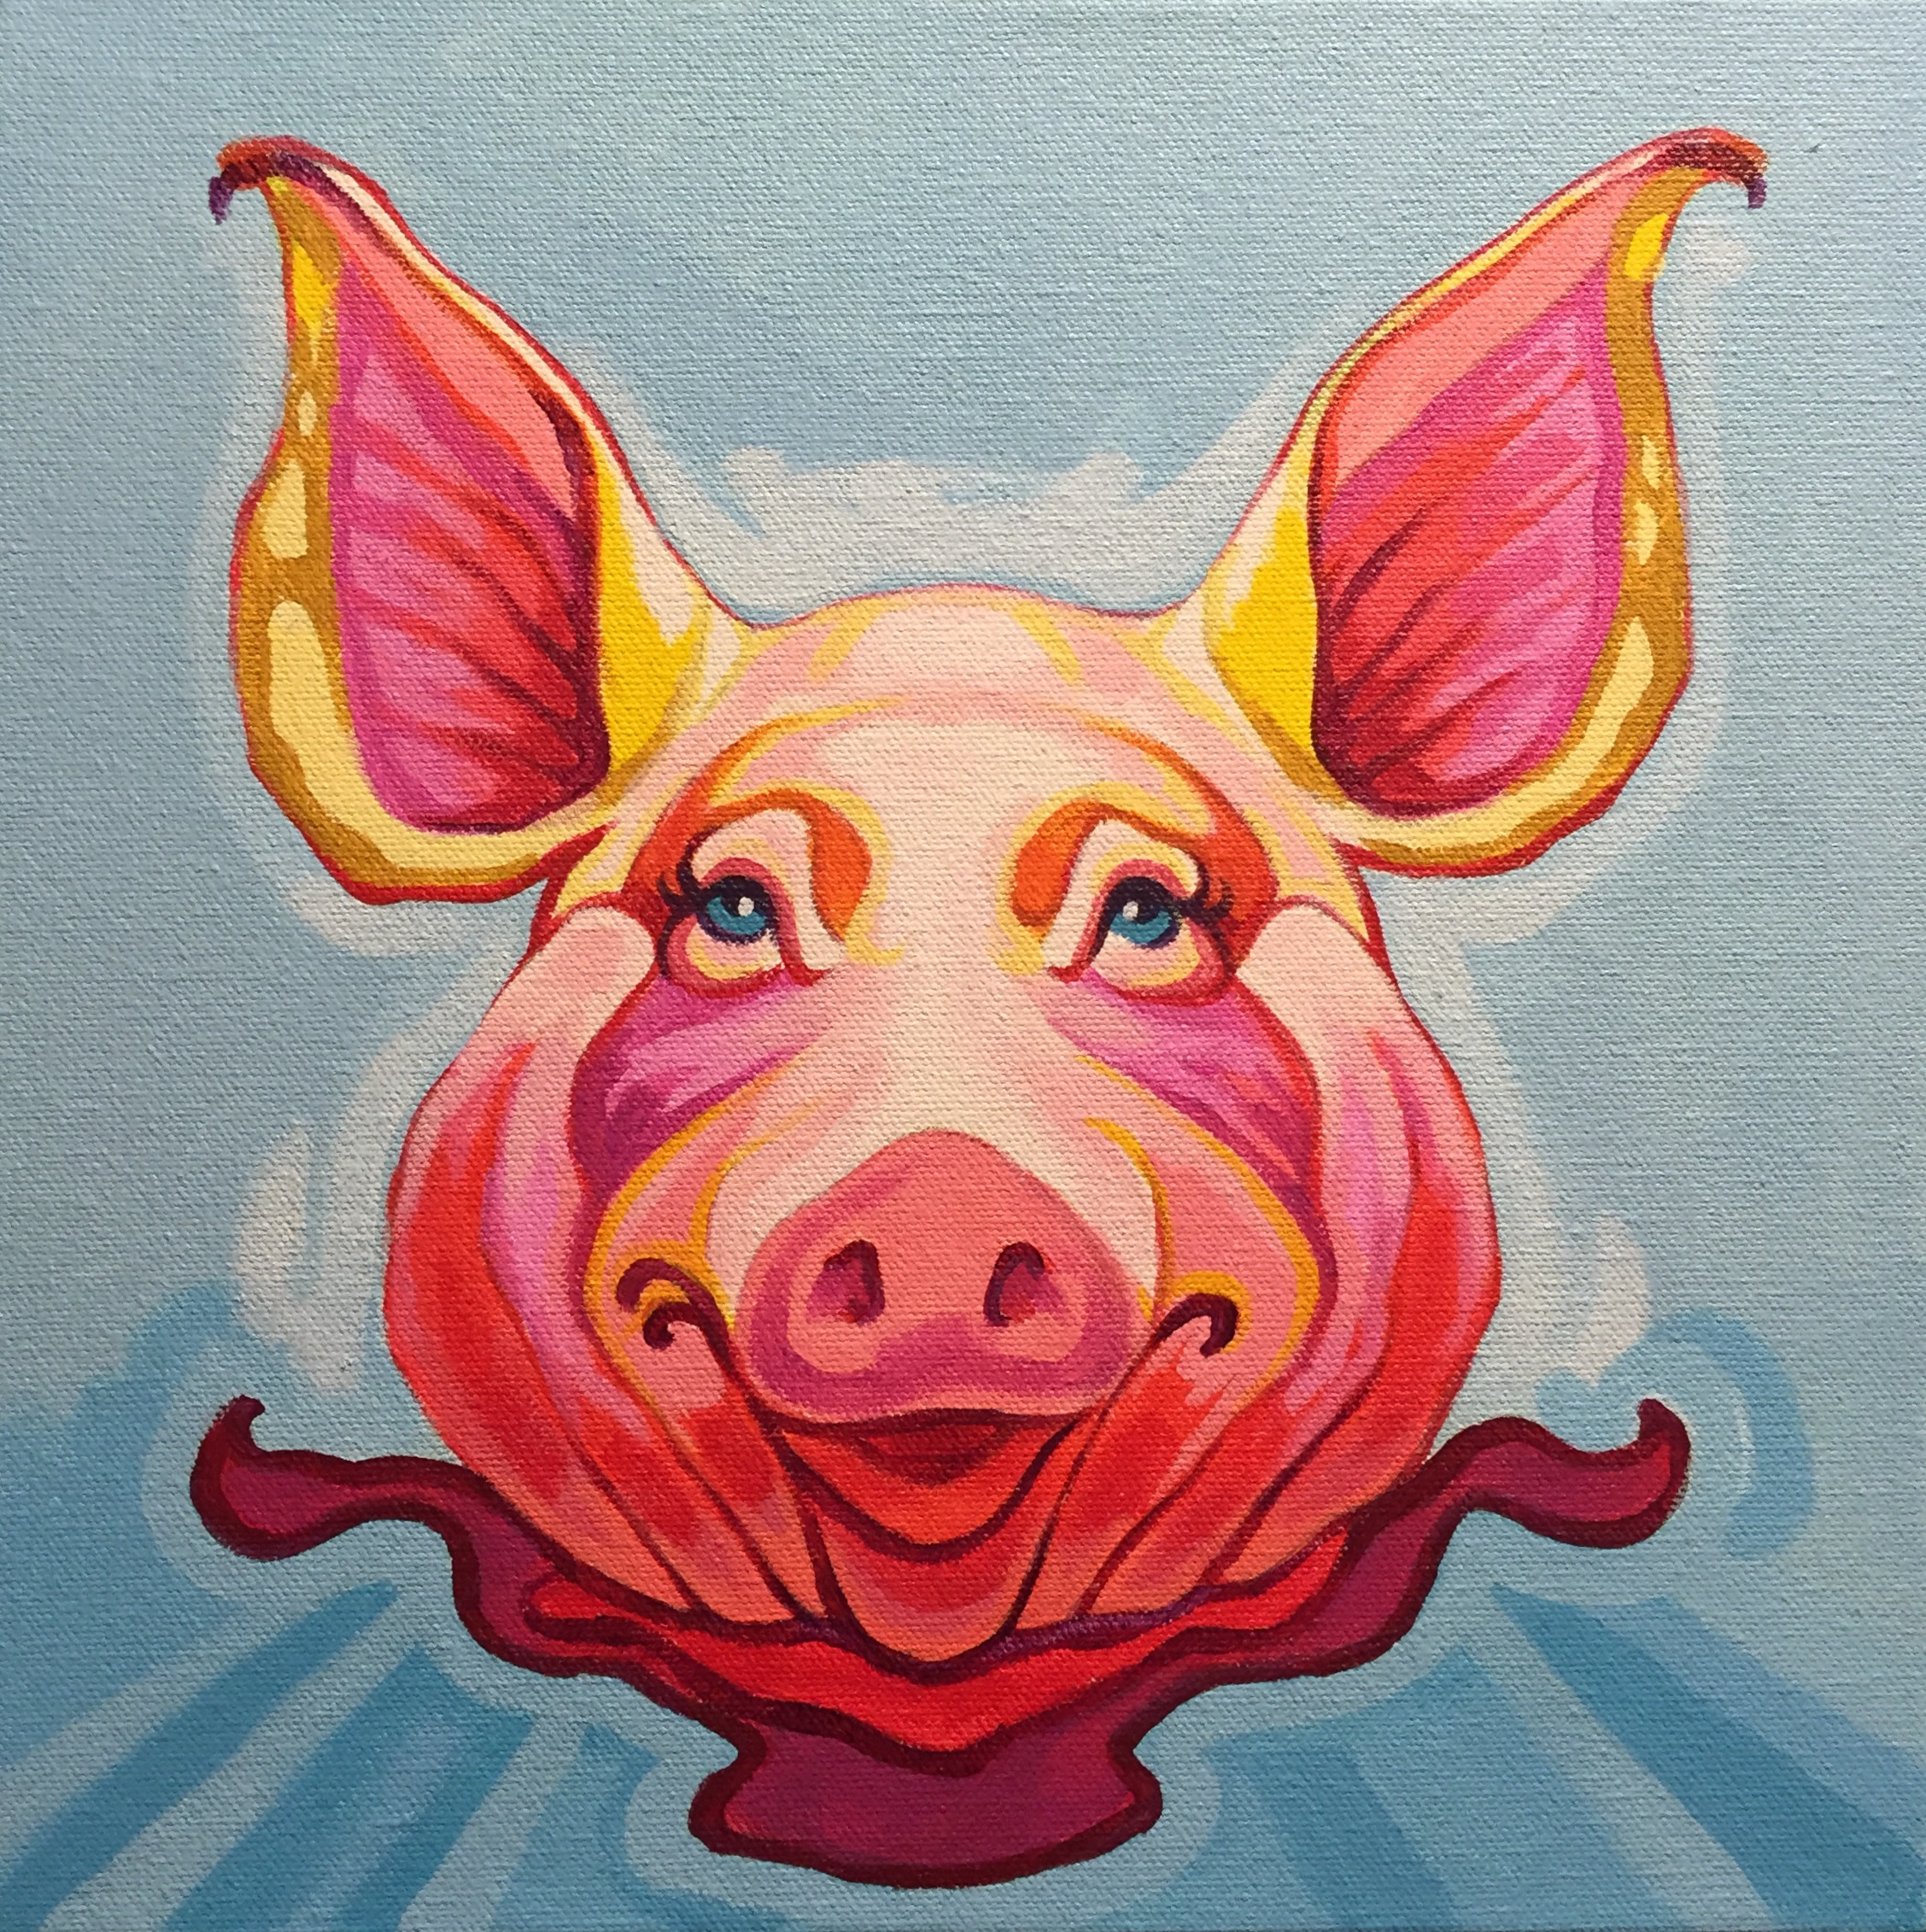 Marilyn - Three Little Pigs II